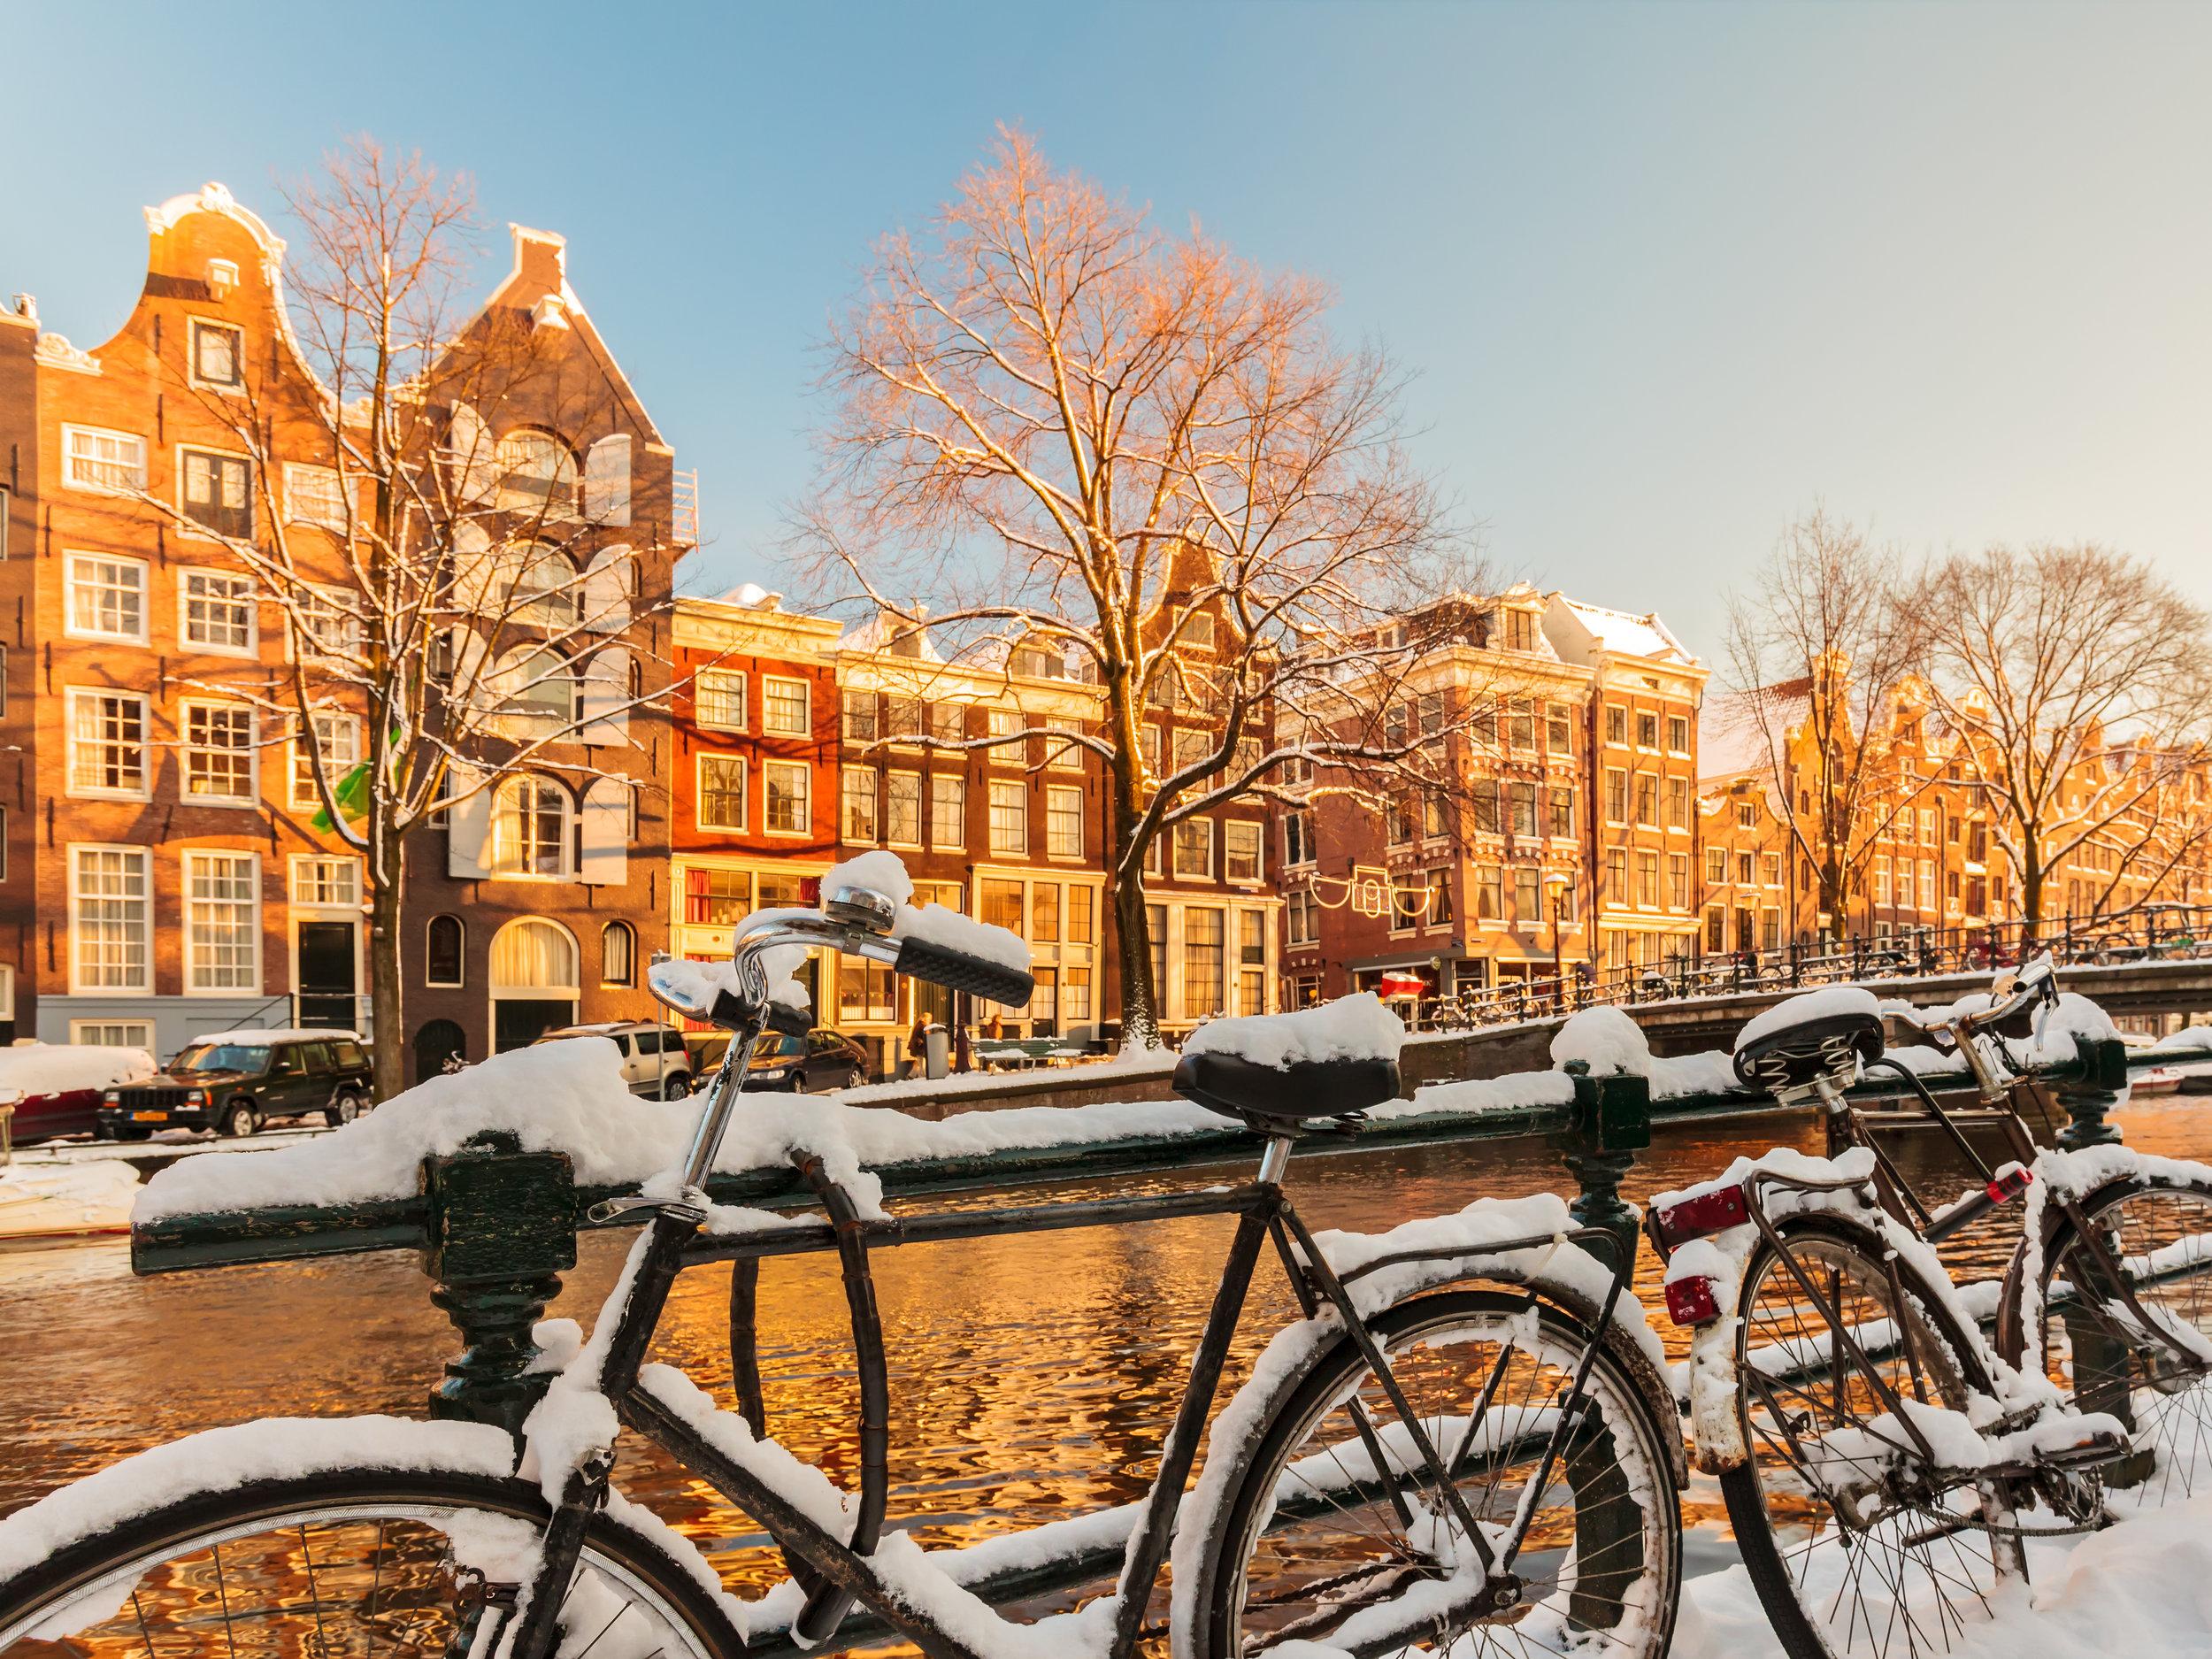 Amsterdam bikes snow.jpeg